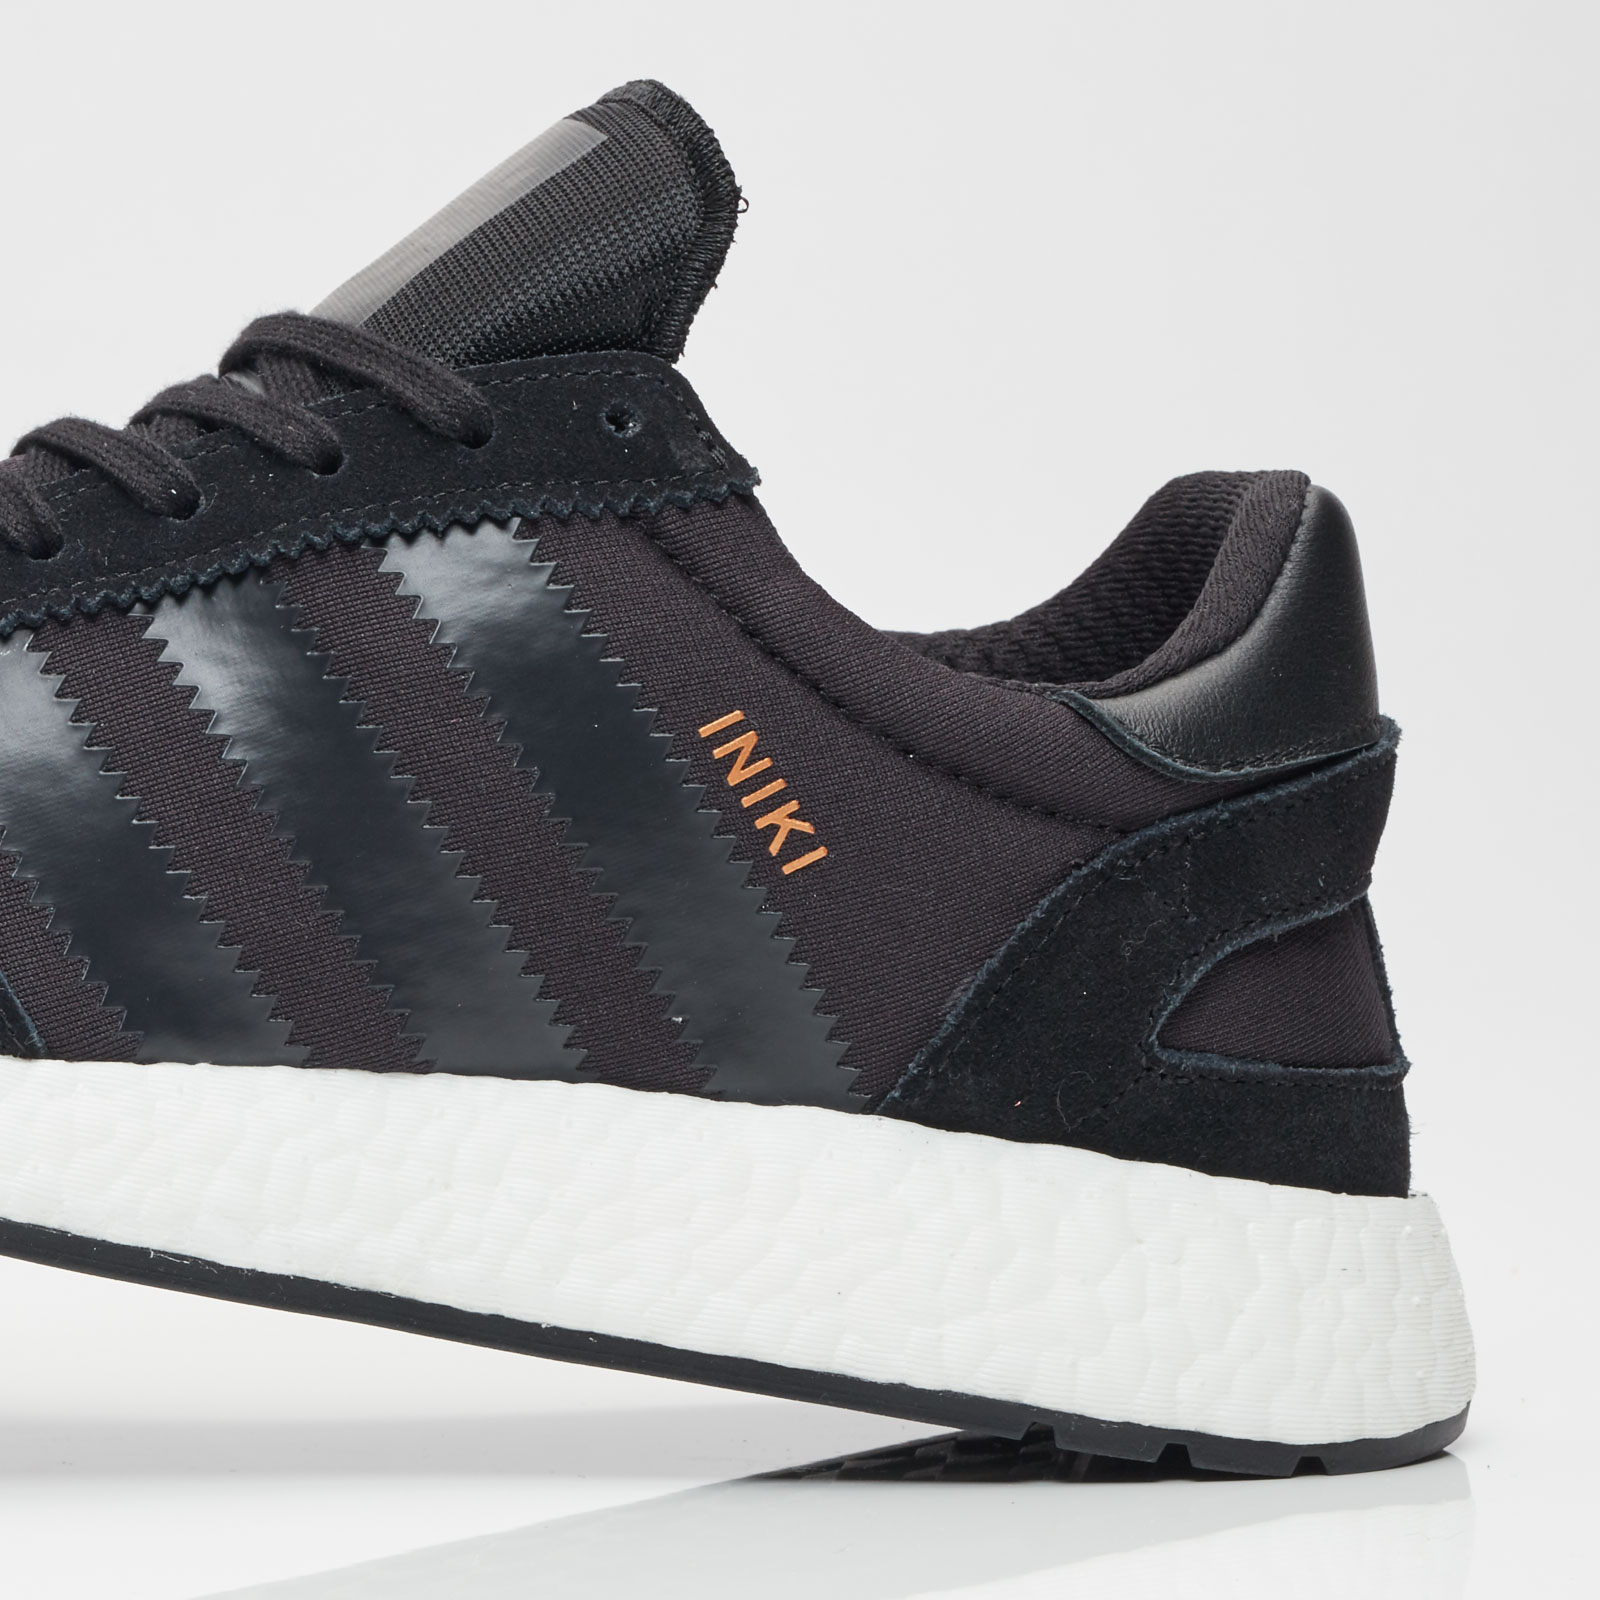 bd83d67c4b82 adidas Iniki Runner - By9730 - Sneakersnstuff